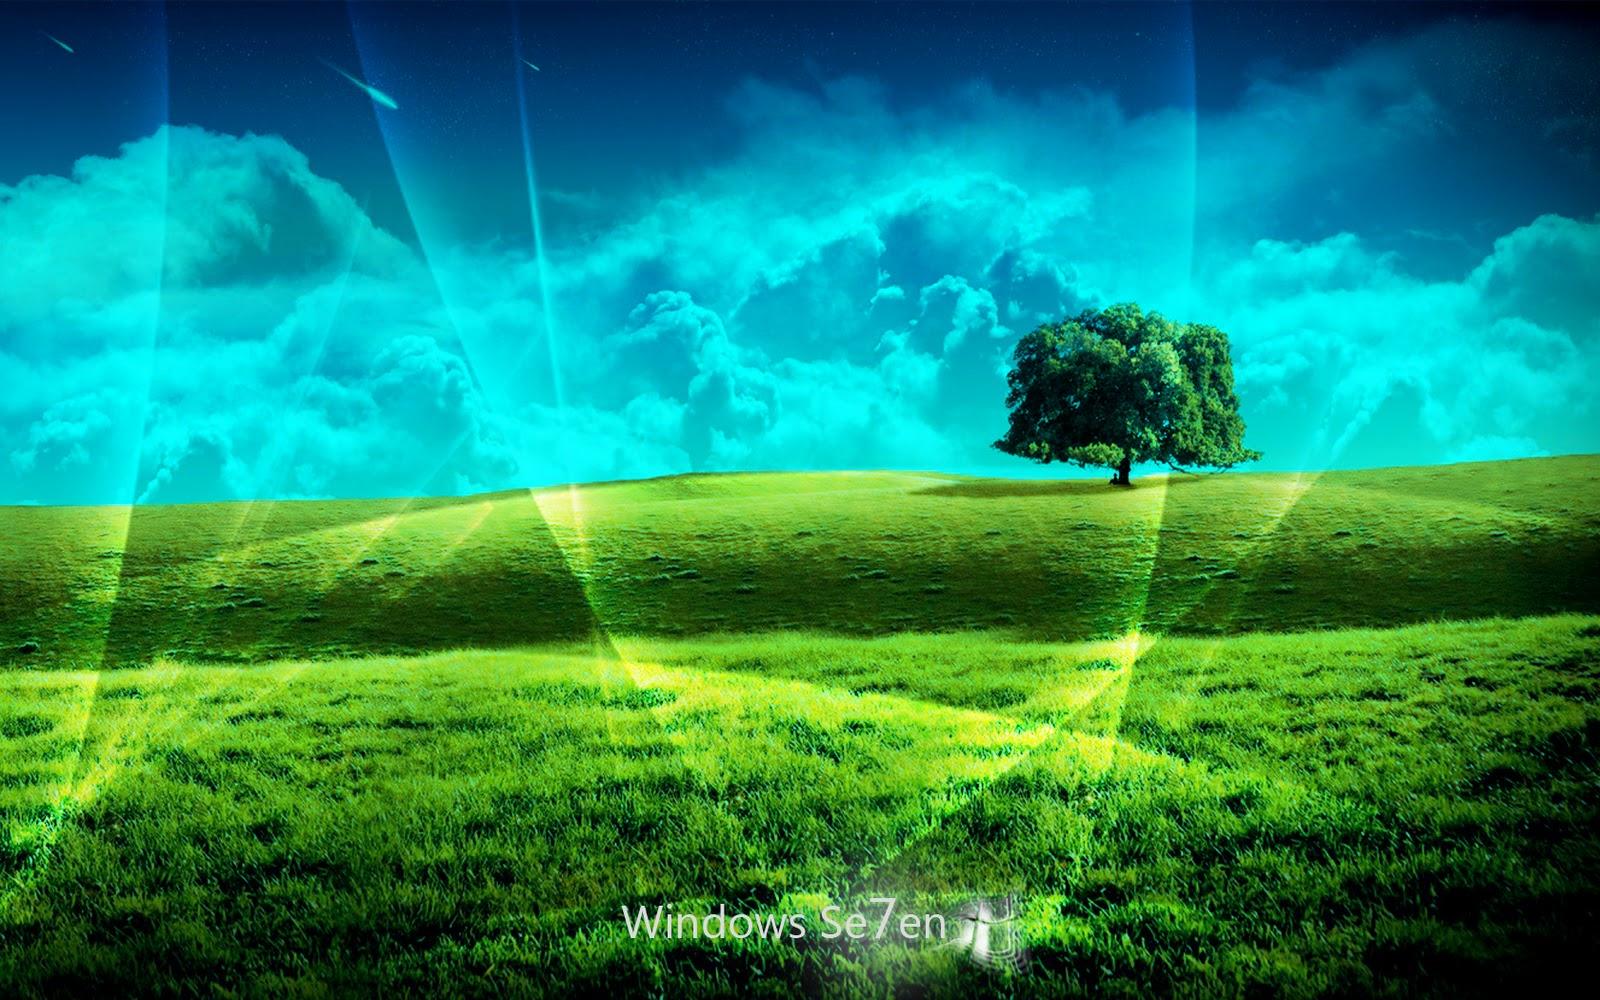 http://1.bp.blogspot.com/-PvigfiytzVM/UVsWdm0t2-I/AAAAAAAADo4/UmpsdFLzUJY/s1600/Free-Animated-Wallpapers-For-Windows-7-721234.jpg